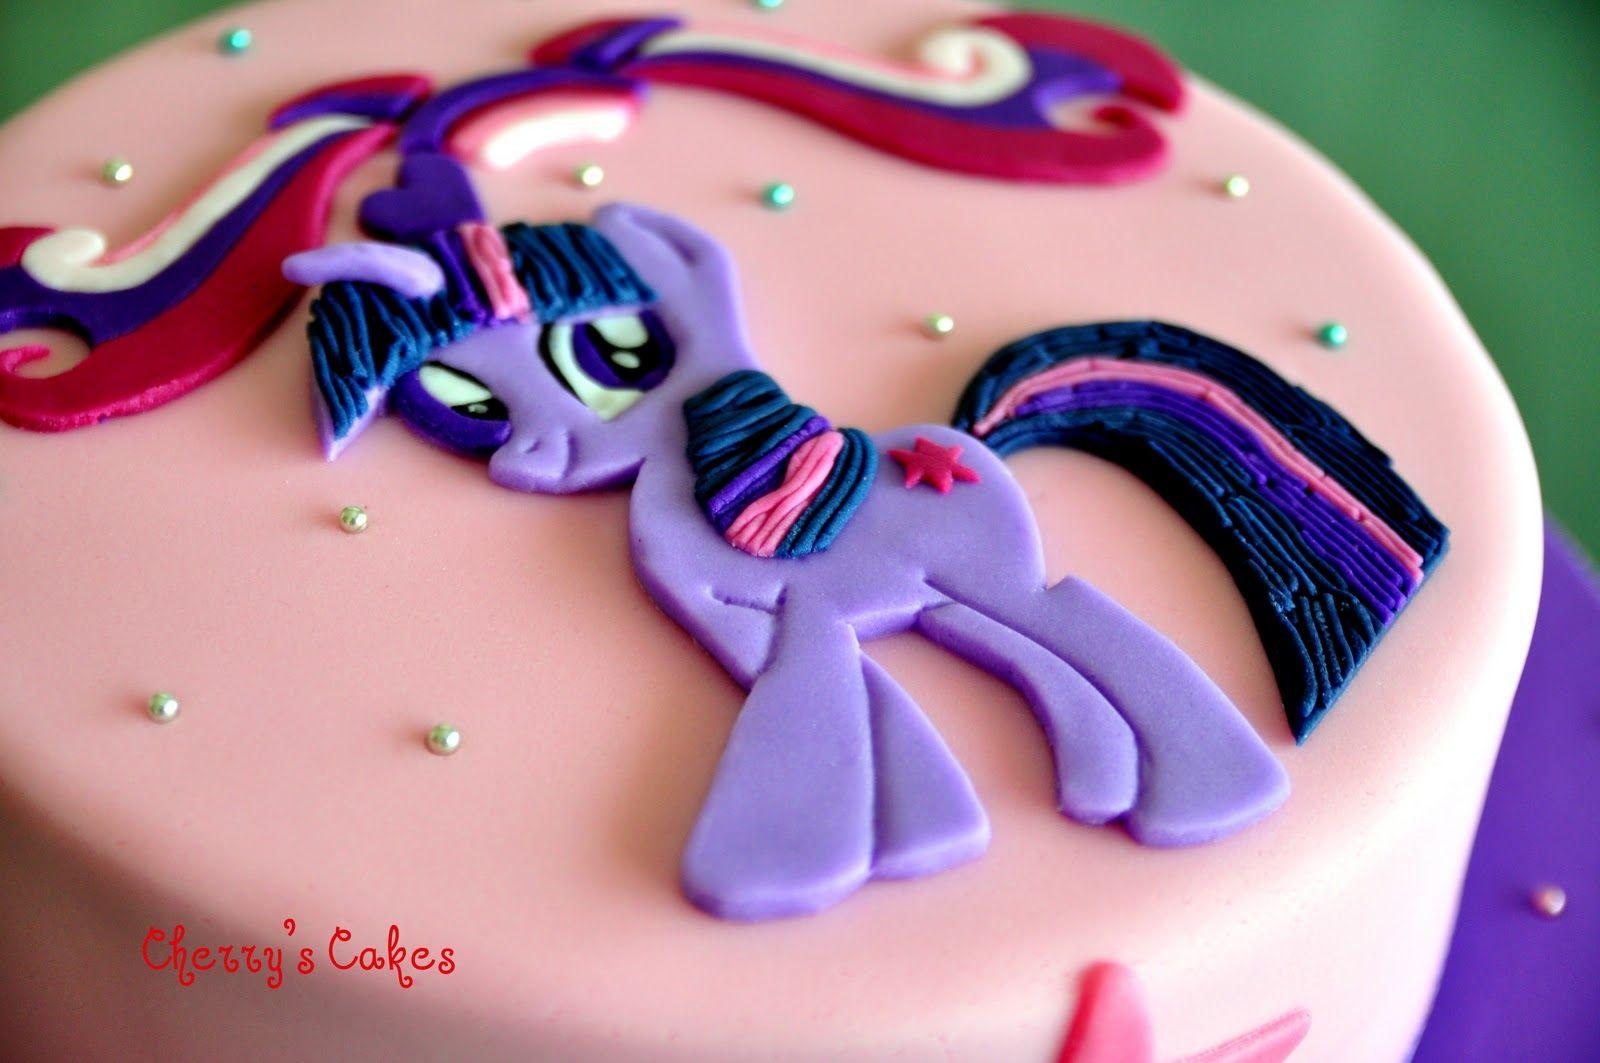 Cherry S Cakes My Little Pony Twilight Sparkle For